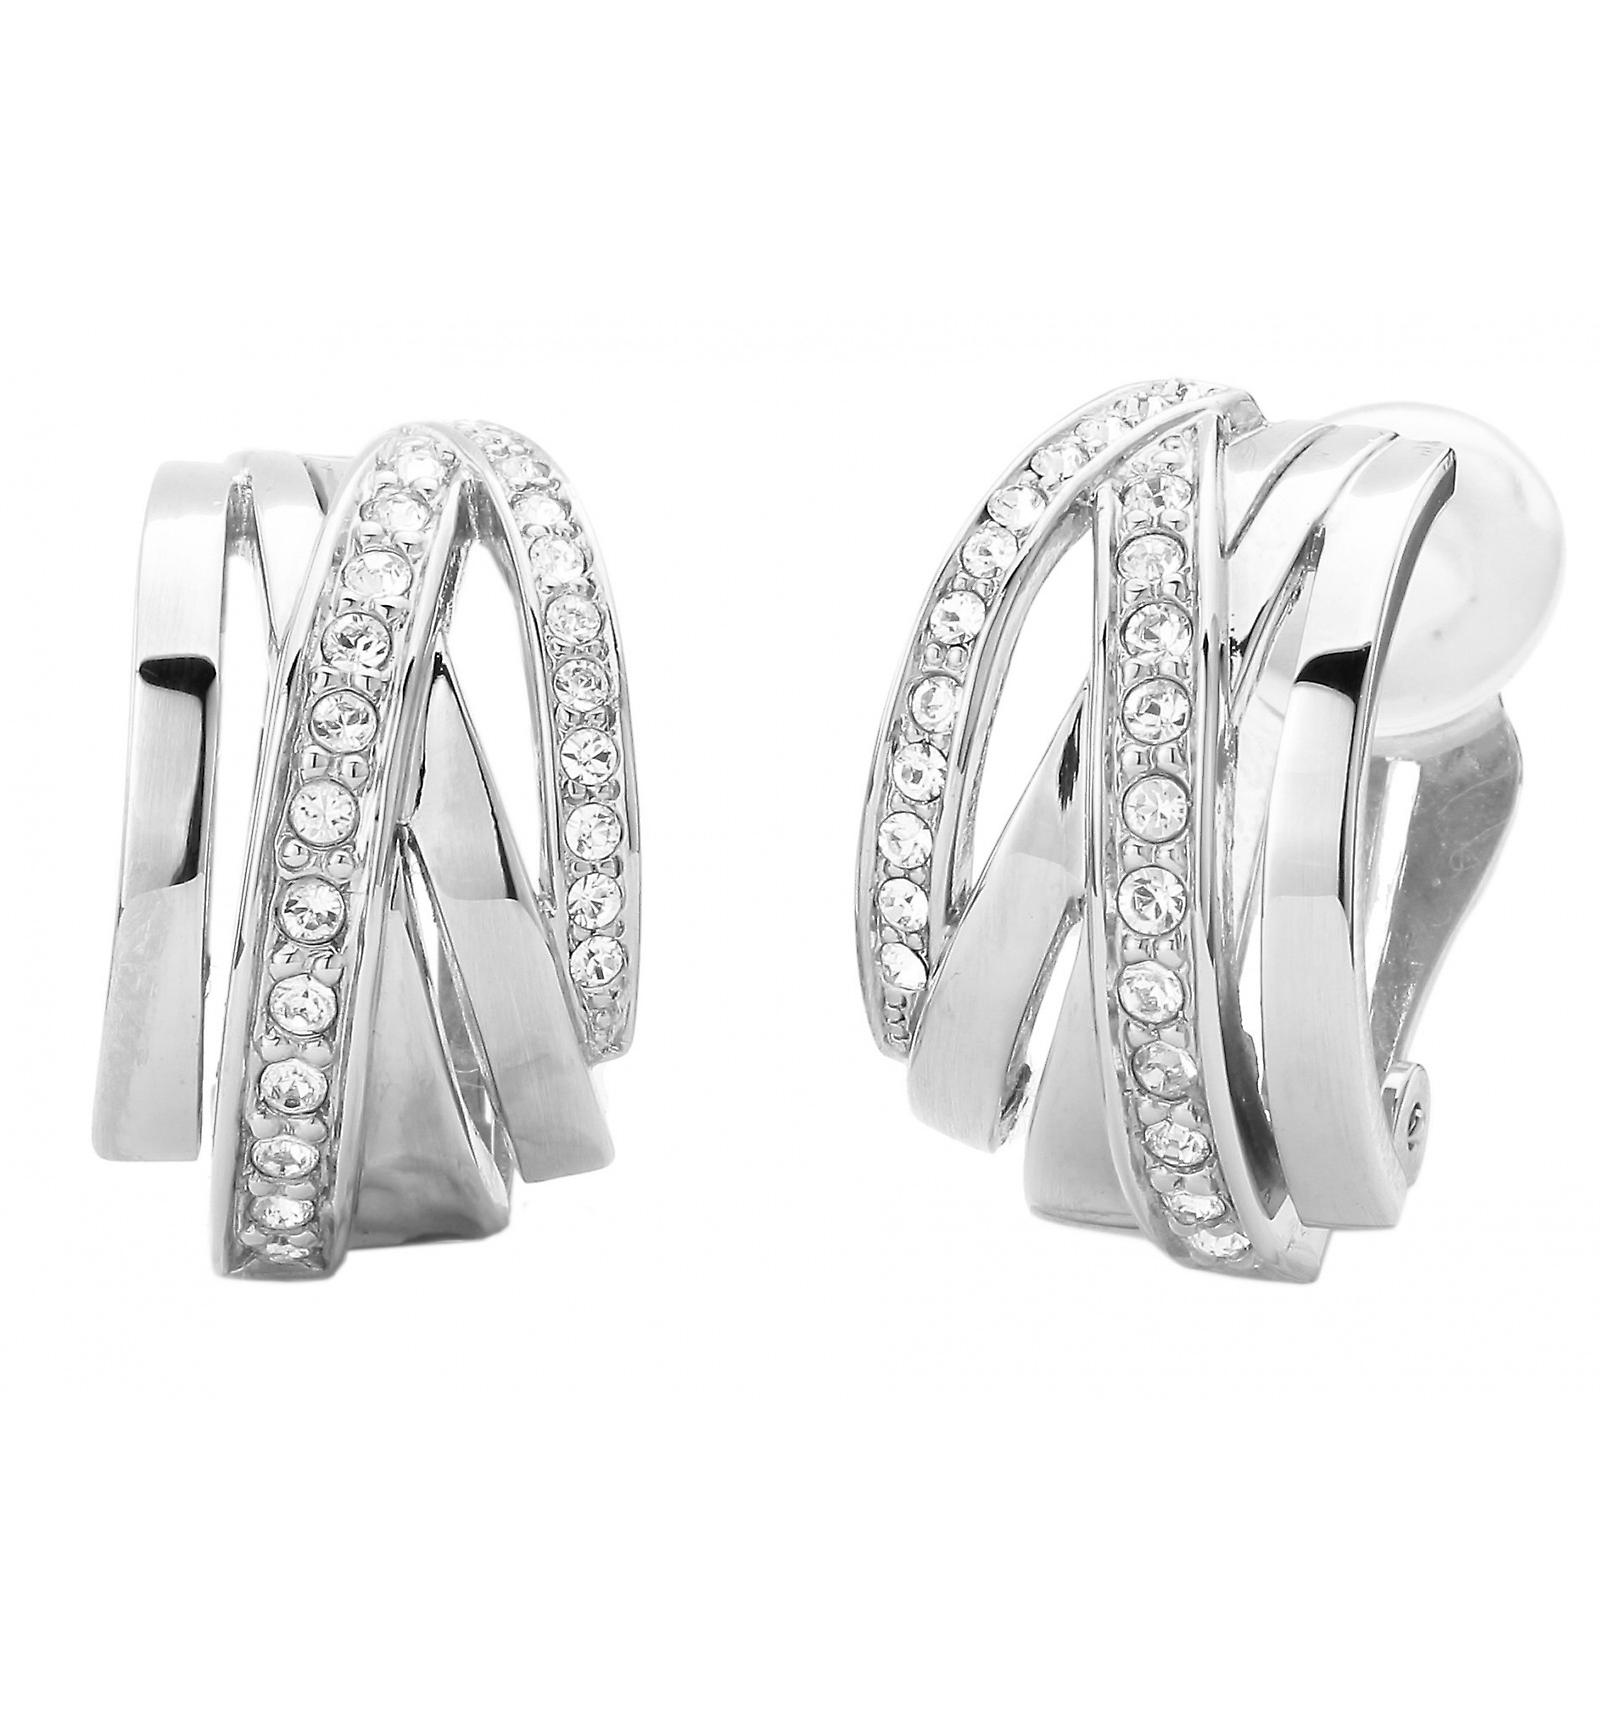 Traveller clip earring - rhodium plated - Swarovski Crystals - 157050